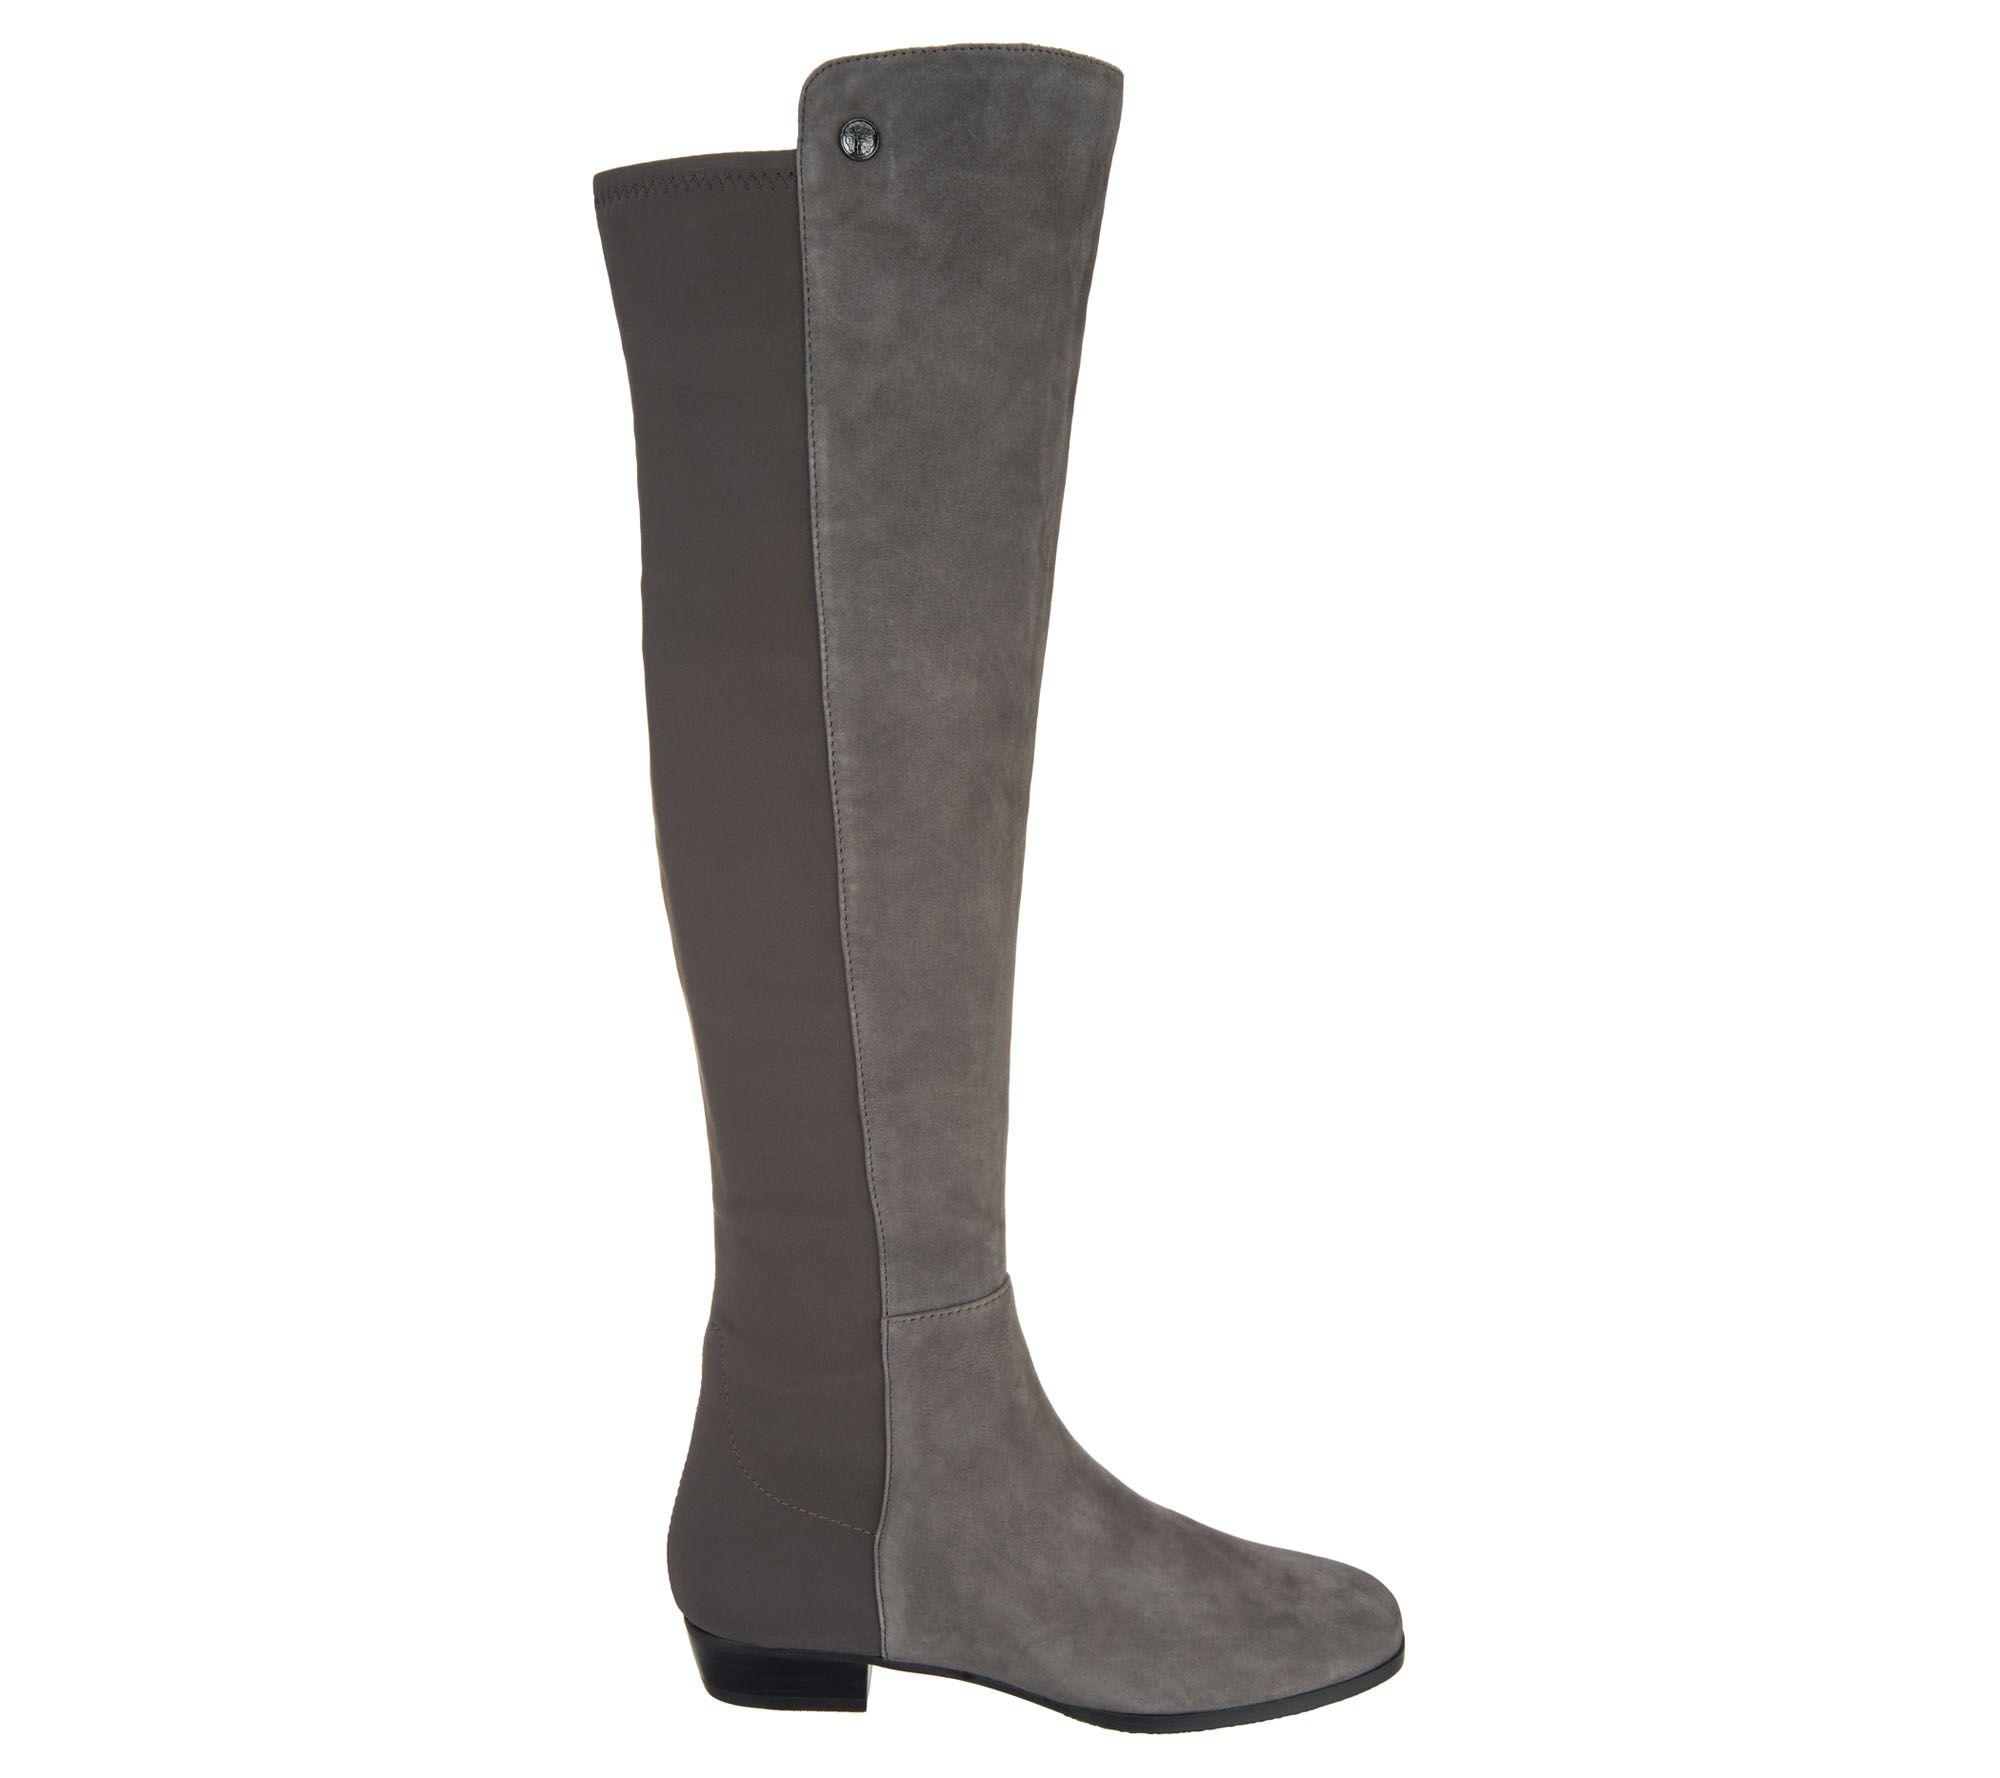 692693a9f842 Vince Camuto Medium Calf Leather Tall Shaft Boots - Karita - Page 1 —  QVC.com